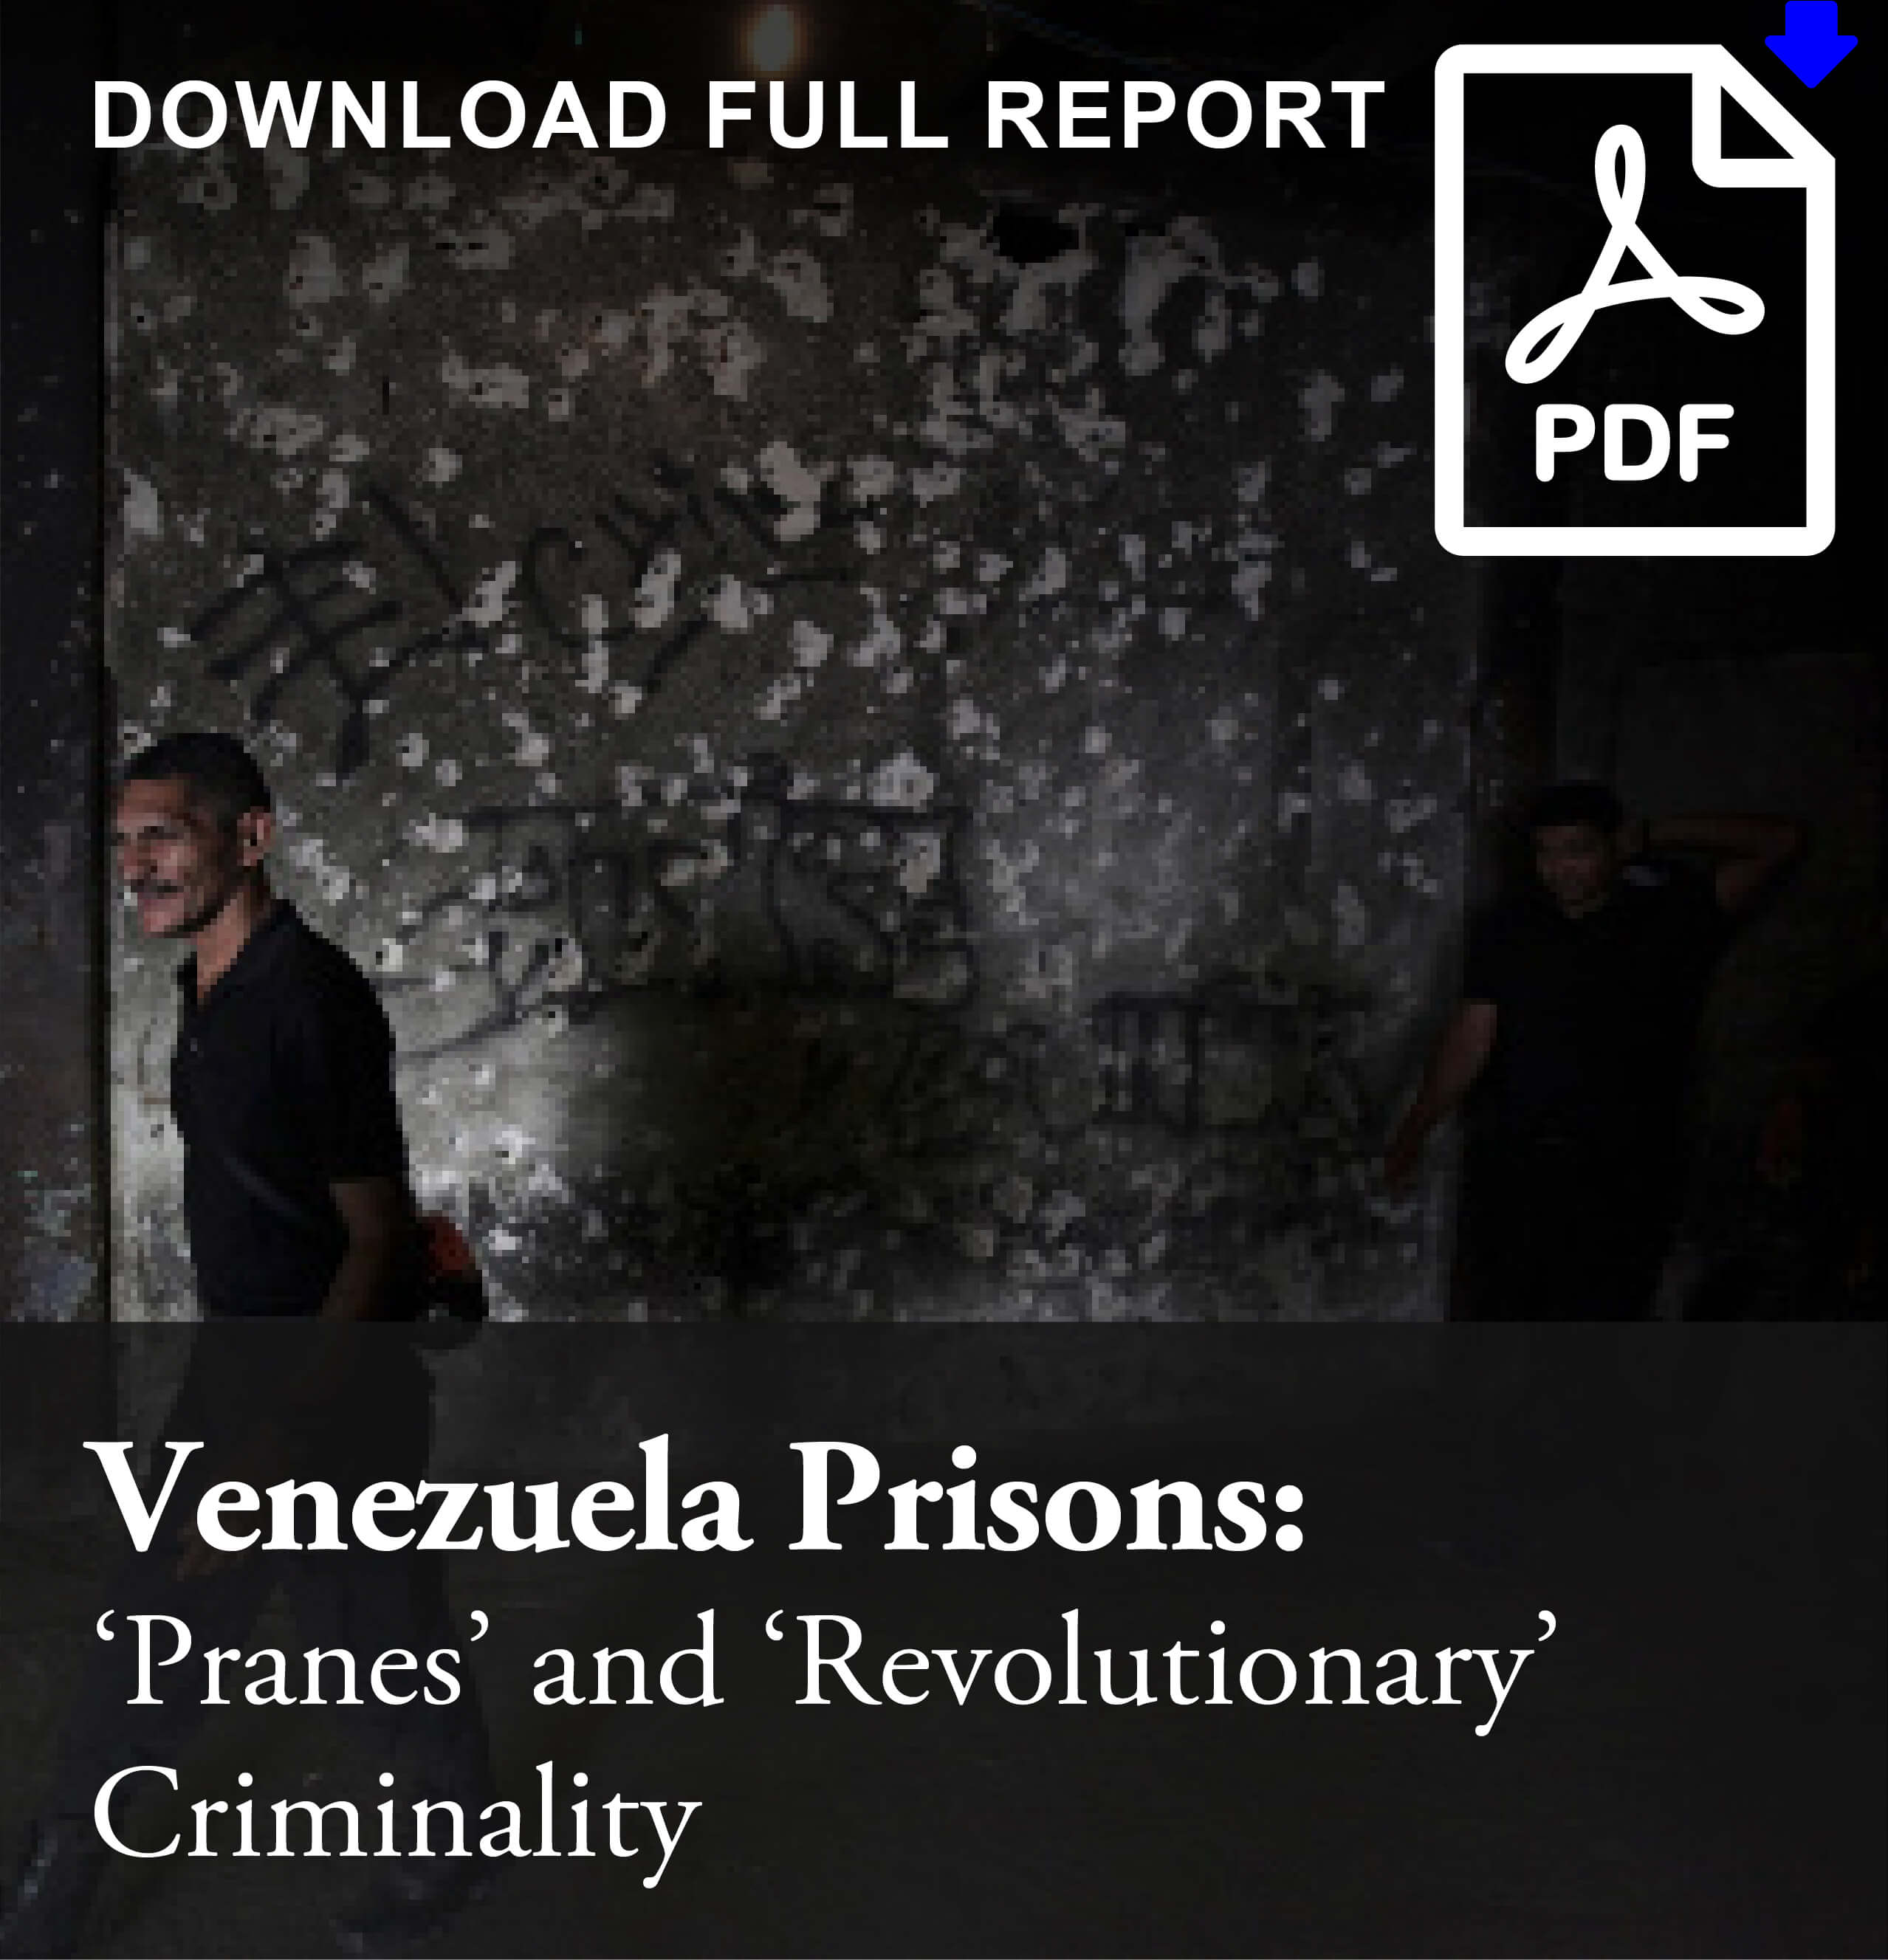 Venezuela Prisons- Pranes and revolutionary criminality-01